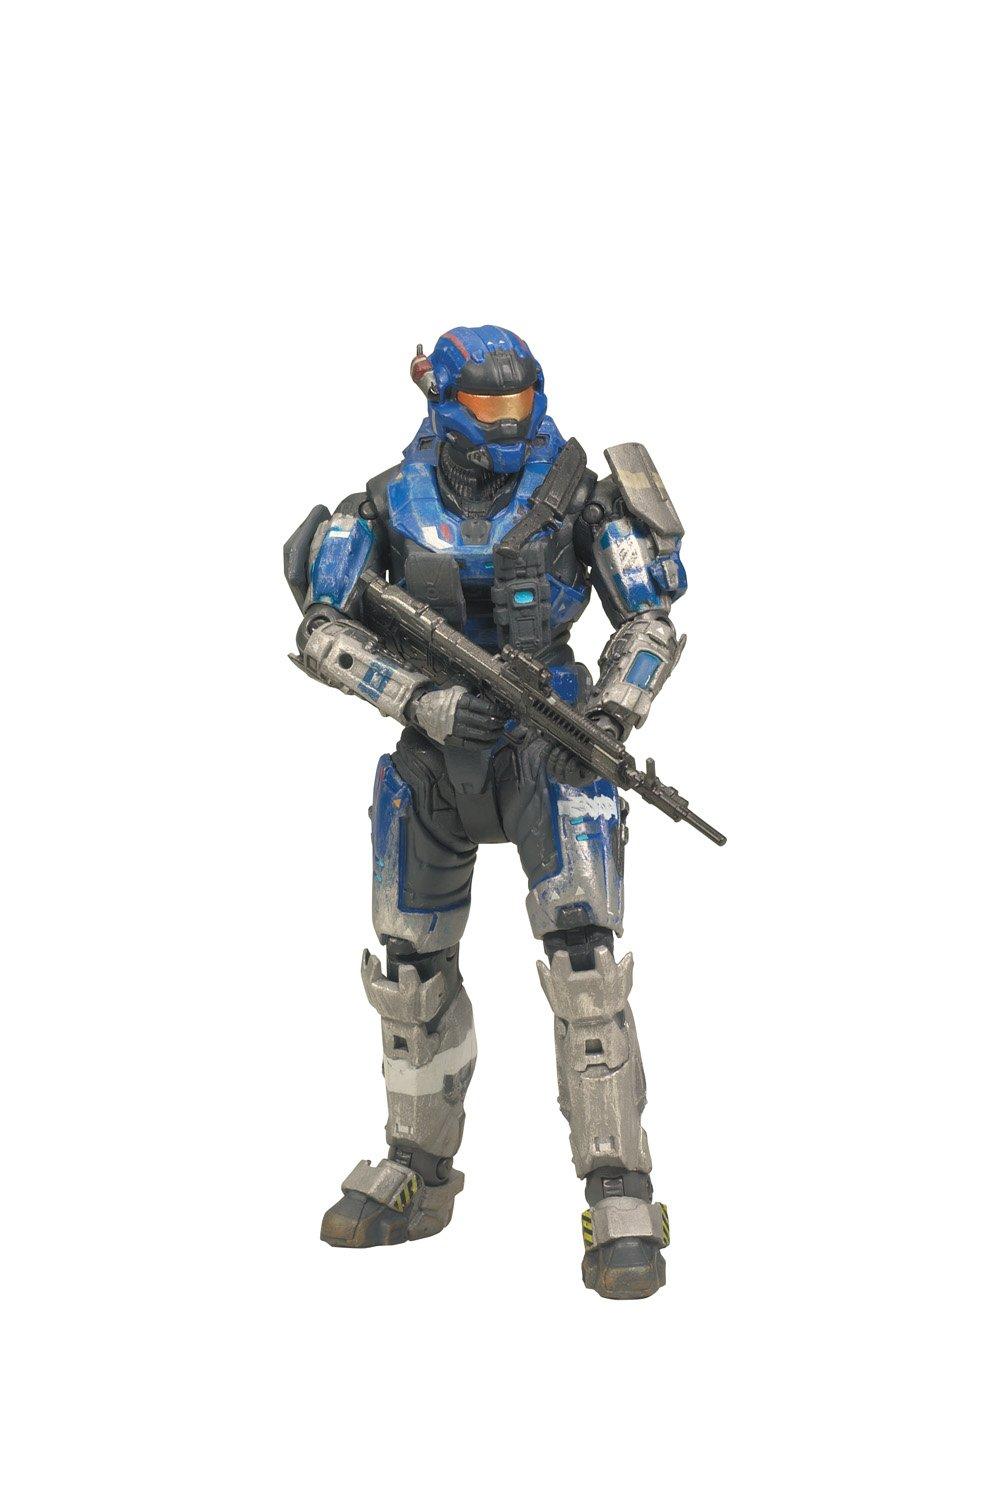 McFarlane Toys Halo Reach Series 2 - Carter Action Figure Blue